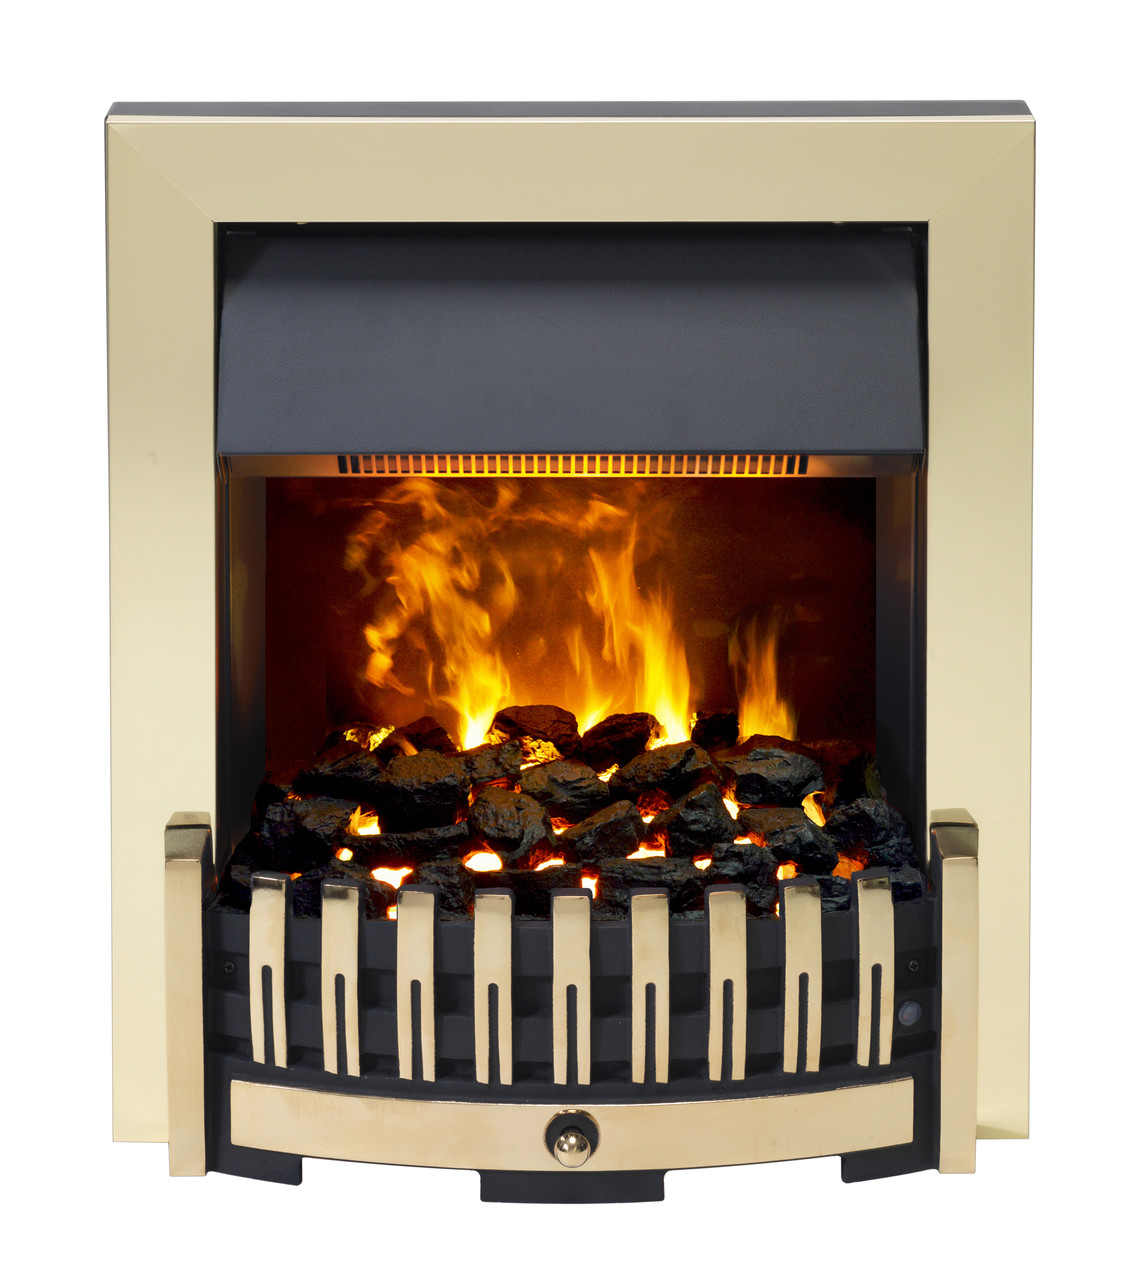 Dimplex Danville Optimyst Electric Fire Cheapest Prices